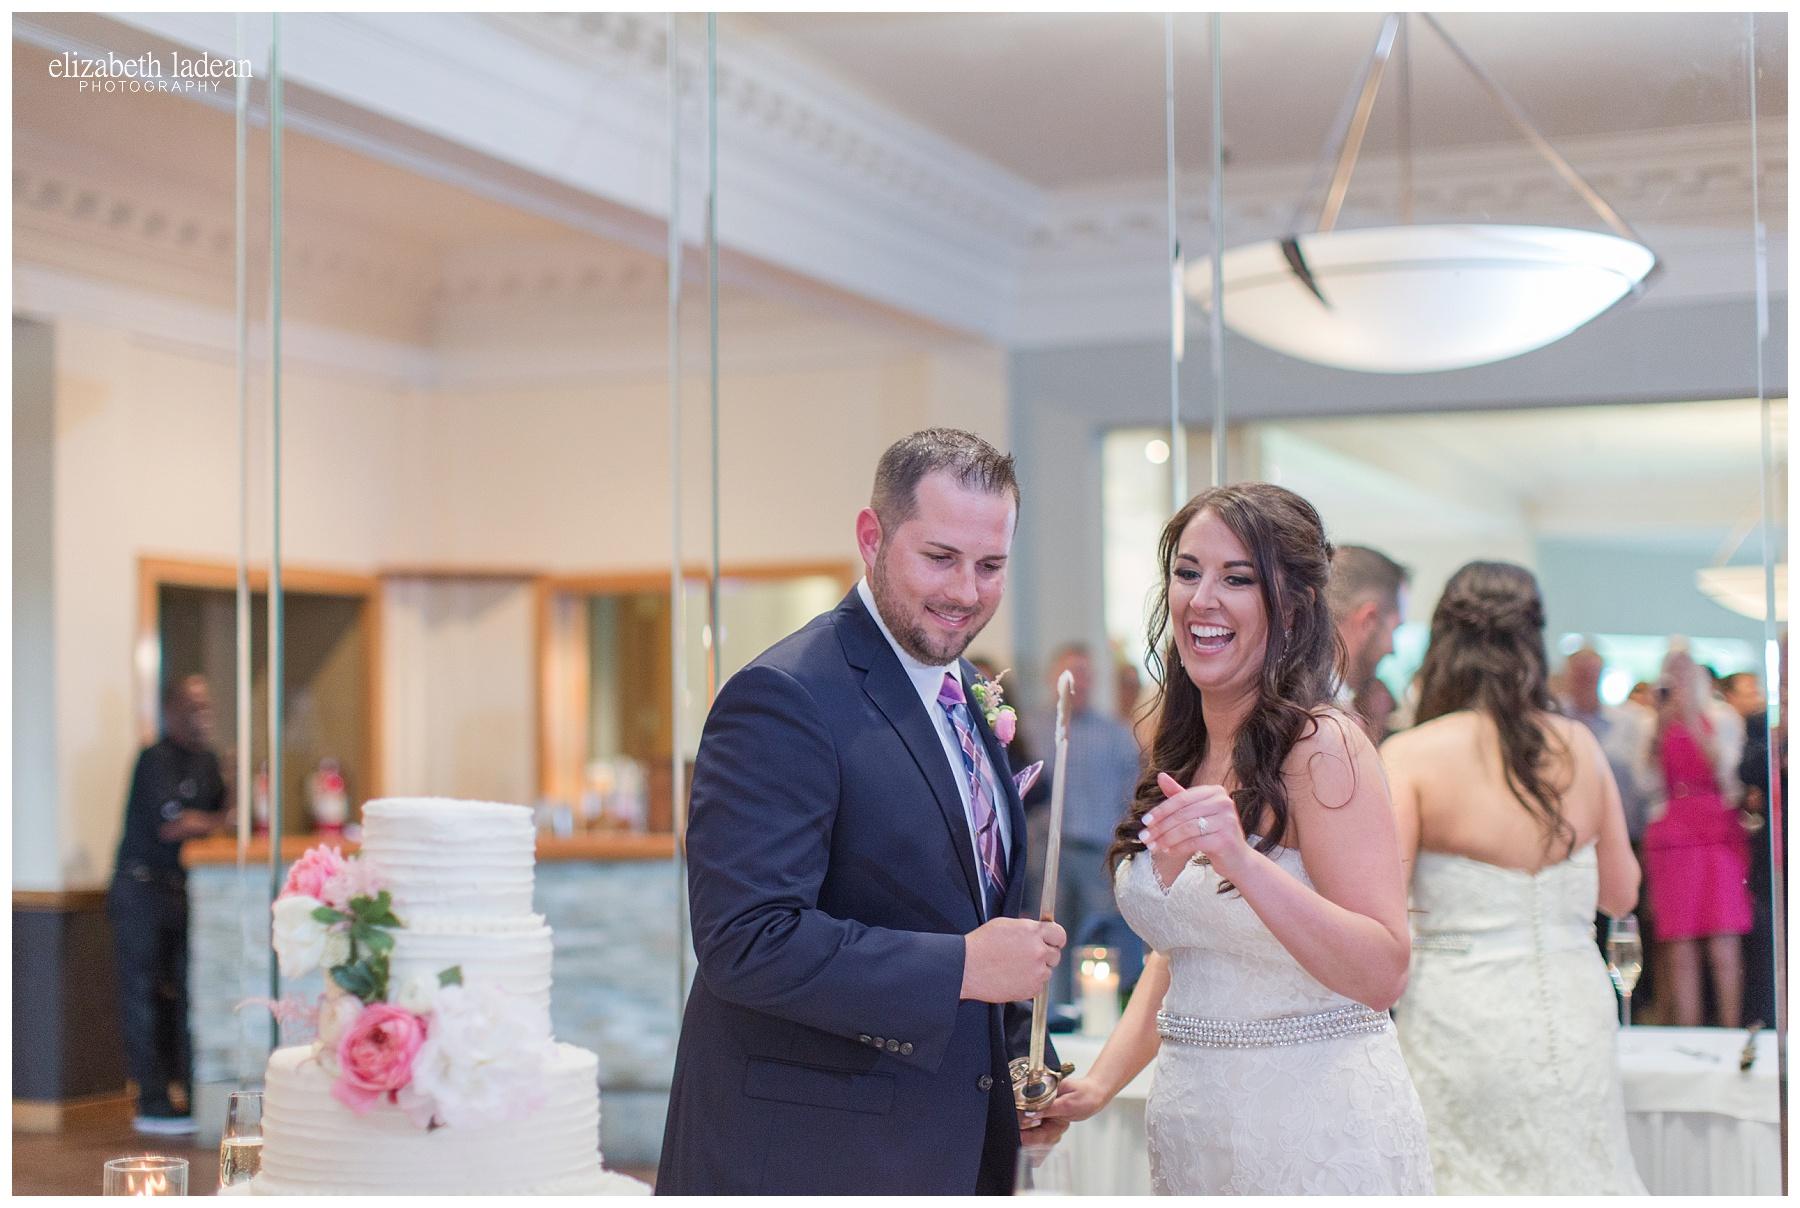 Hillcrest-Country-Club-Kansas-City-Wedding-Photography-E+J-0520-Elizabeth-Ladean-Photography-photo_0862.jpg